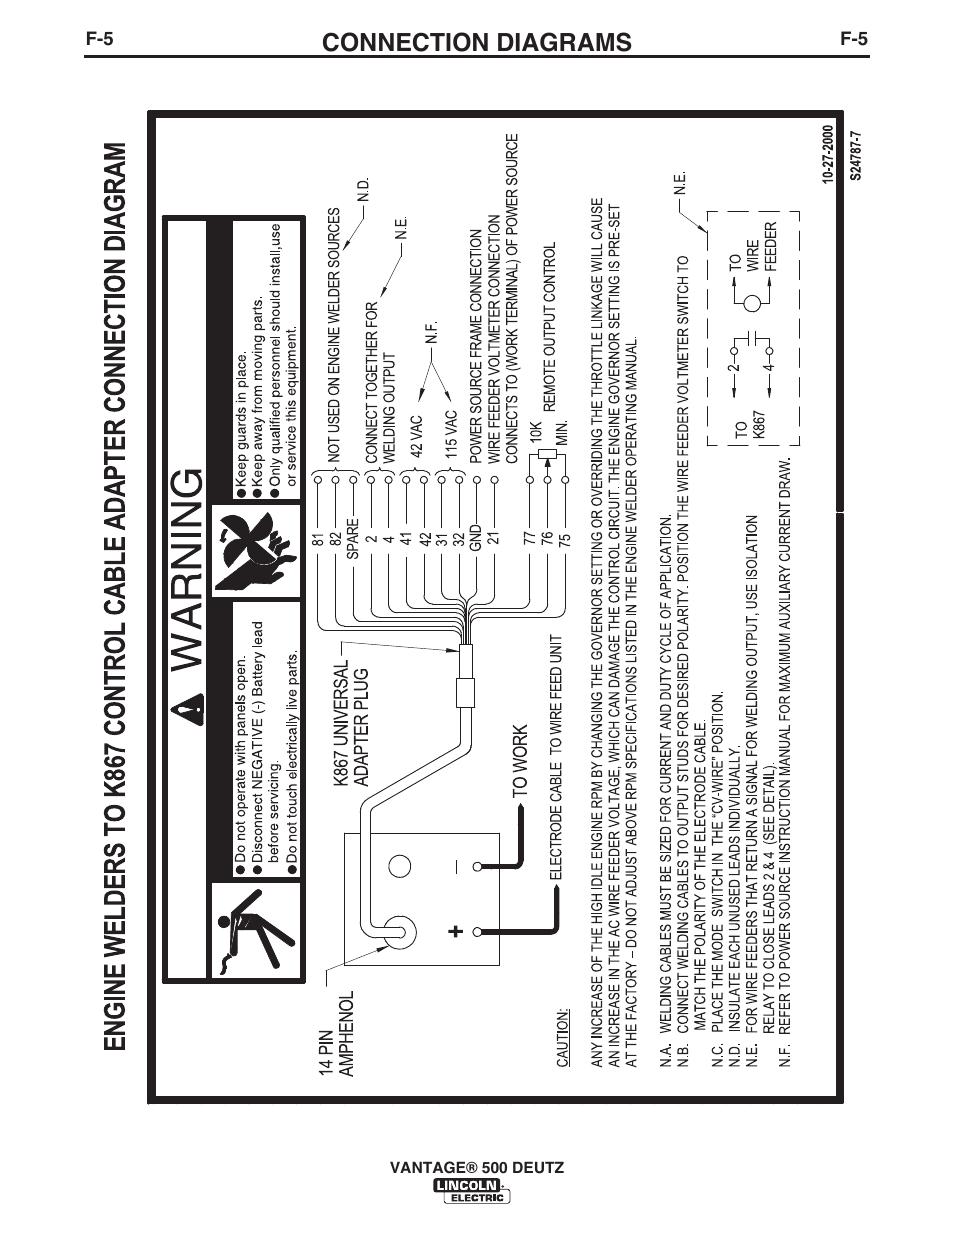 medium resolution of connection diagrams lincoln electric im954 vantage 500 deutz user manual page 41 53